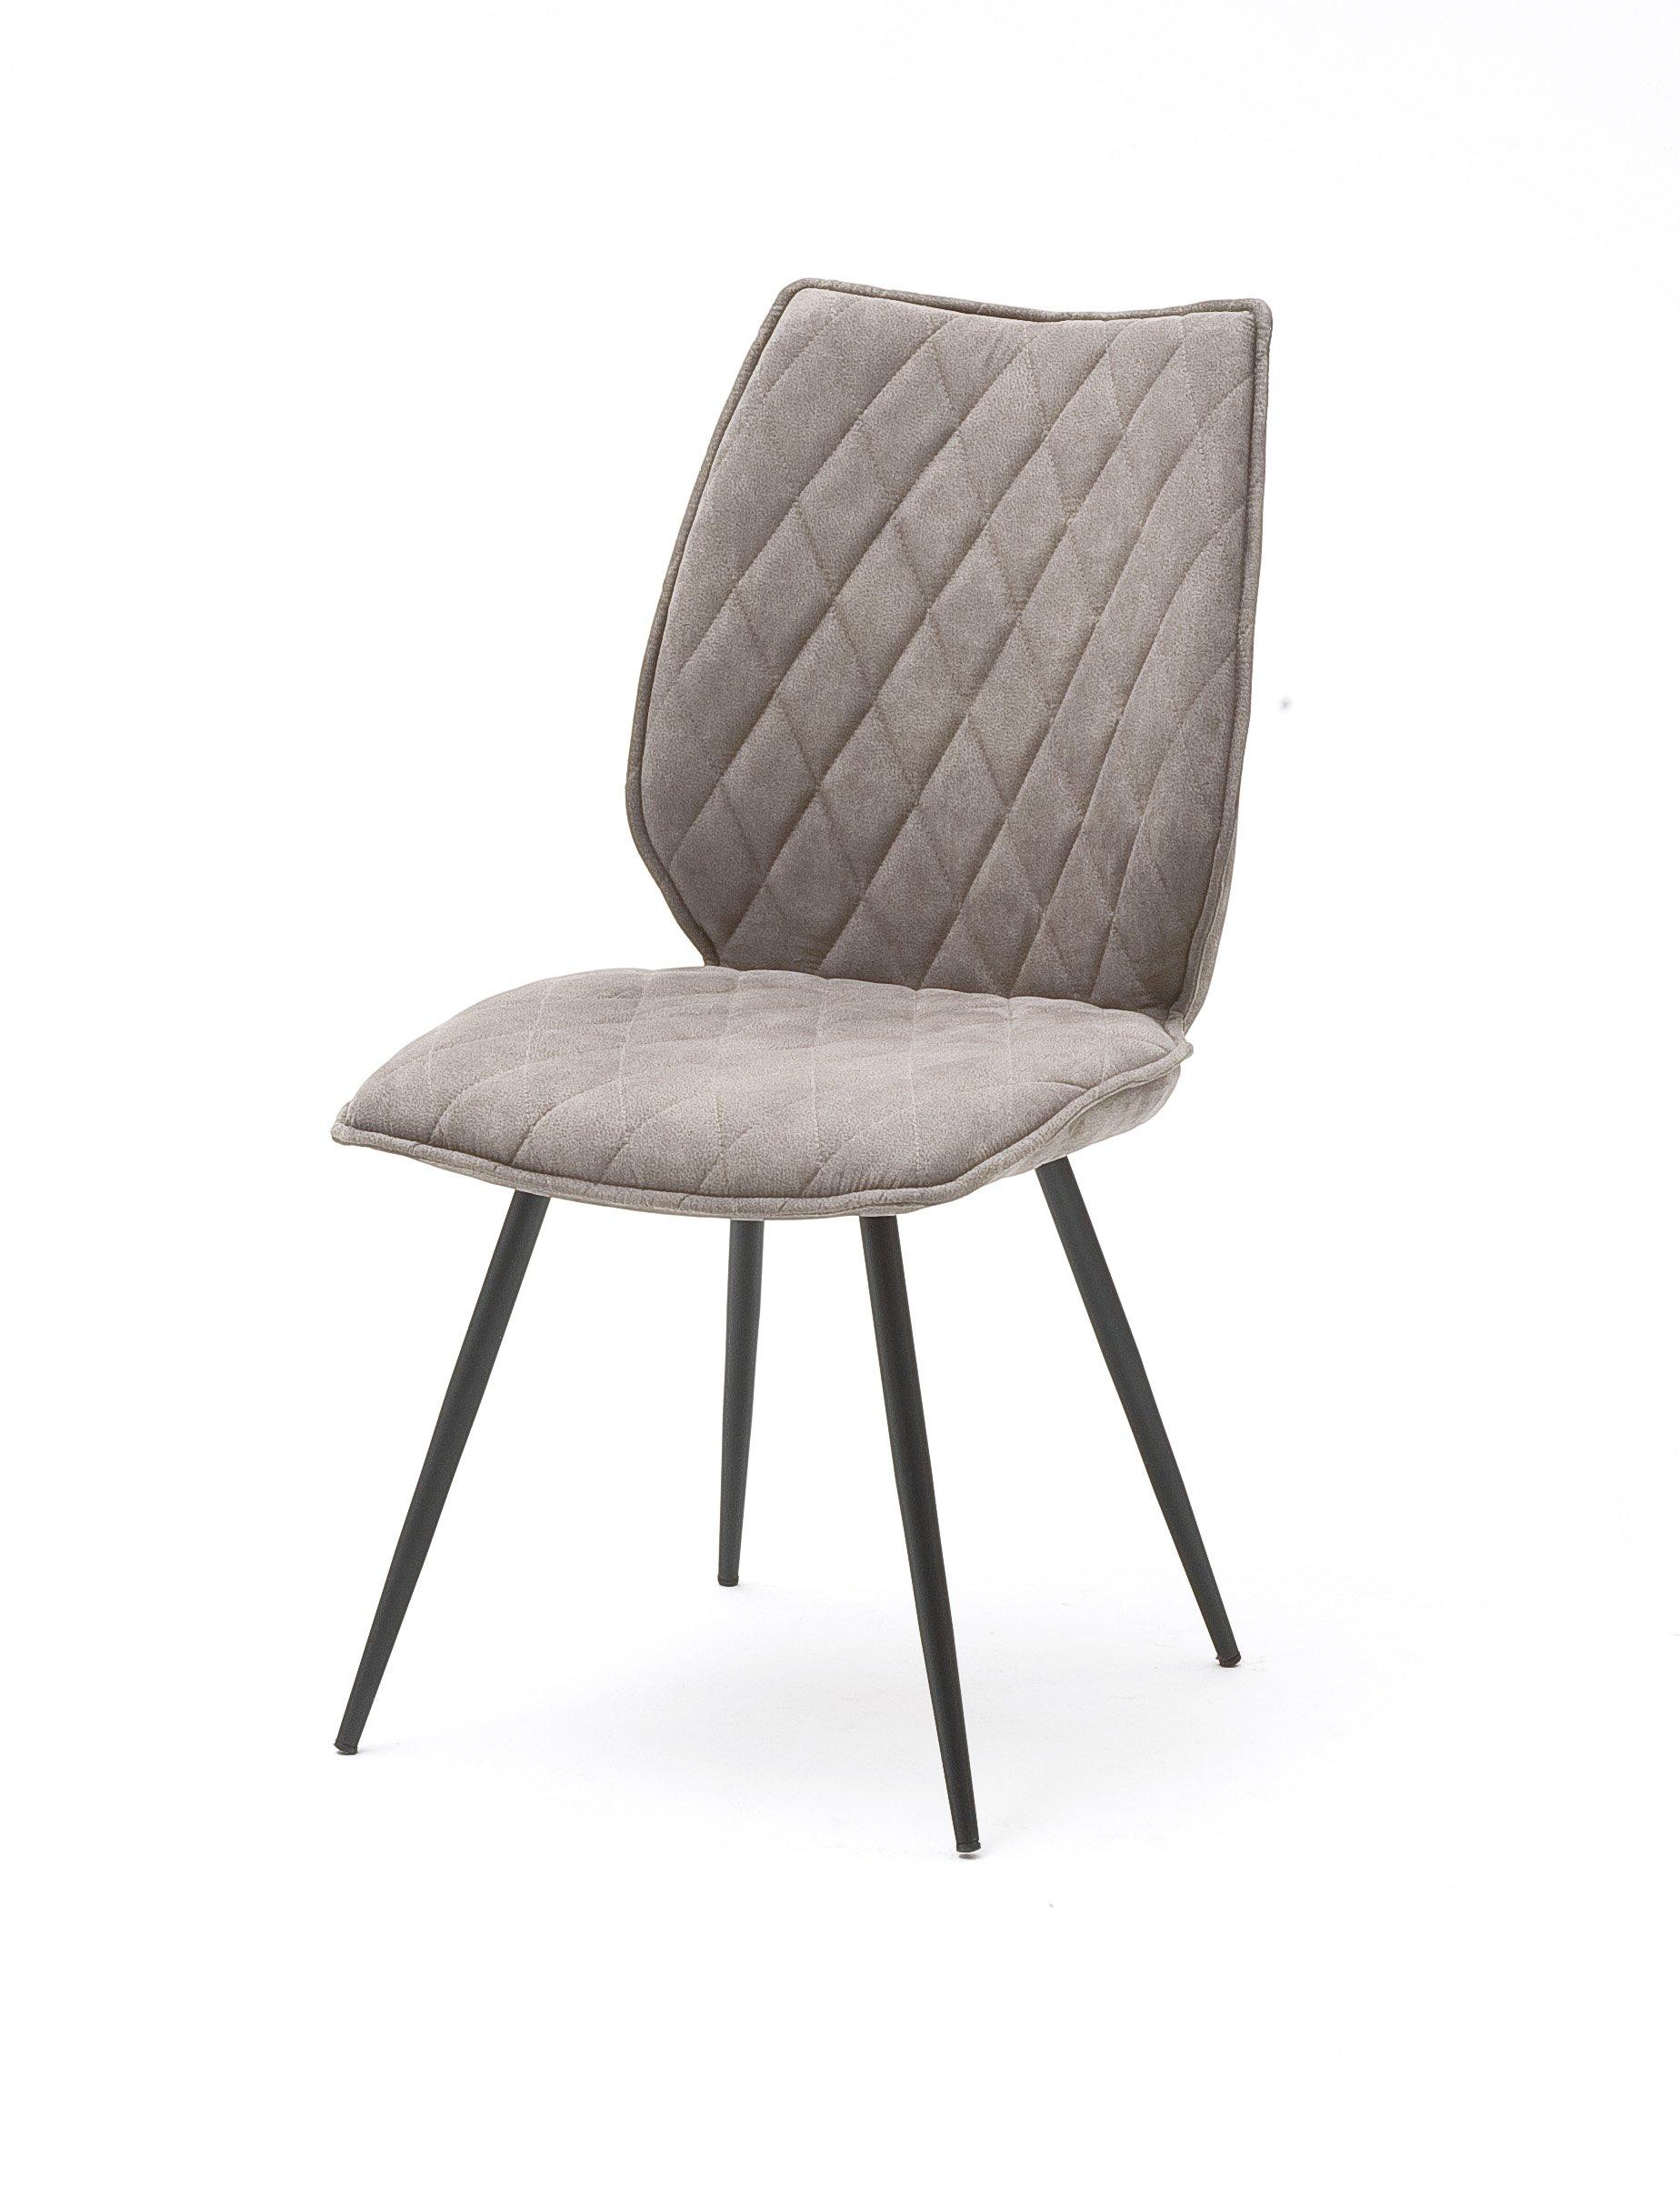 4 Fuß Stuhl, sand